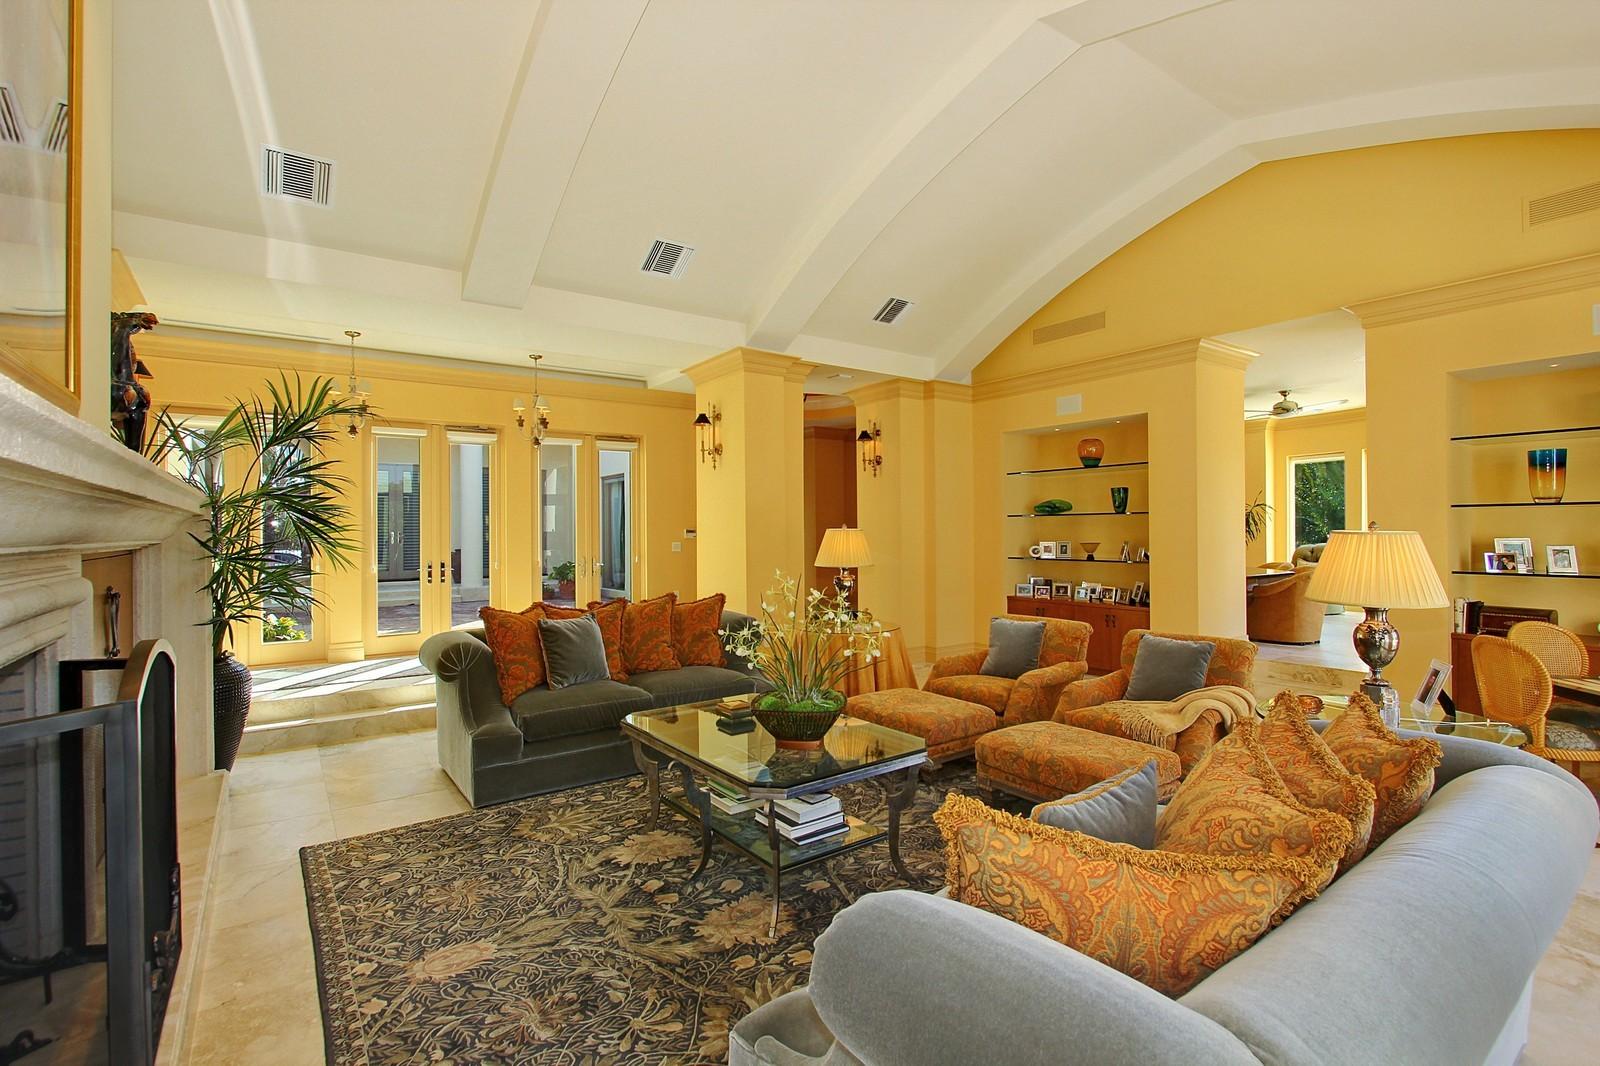 Real Estate Photography - 6814 SE Isle Way, Stuart, FL, 34996 - Living Room 2